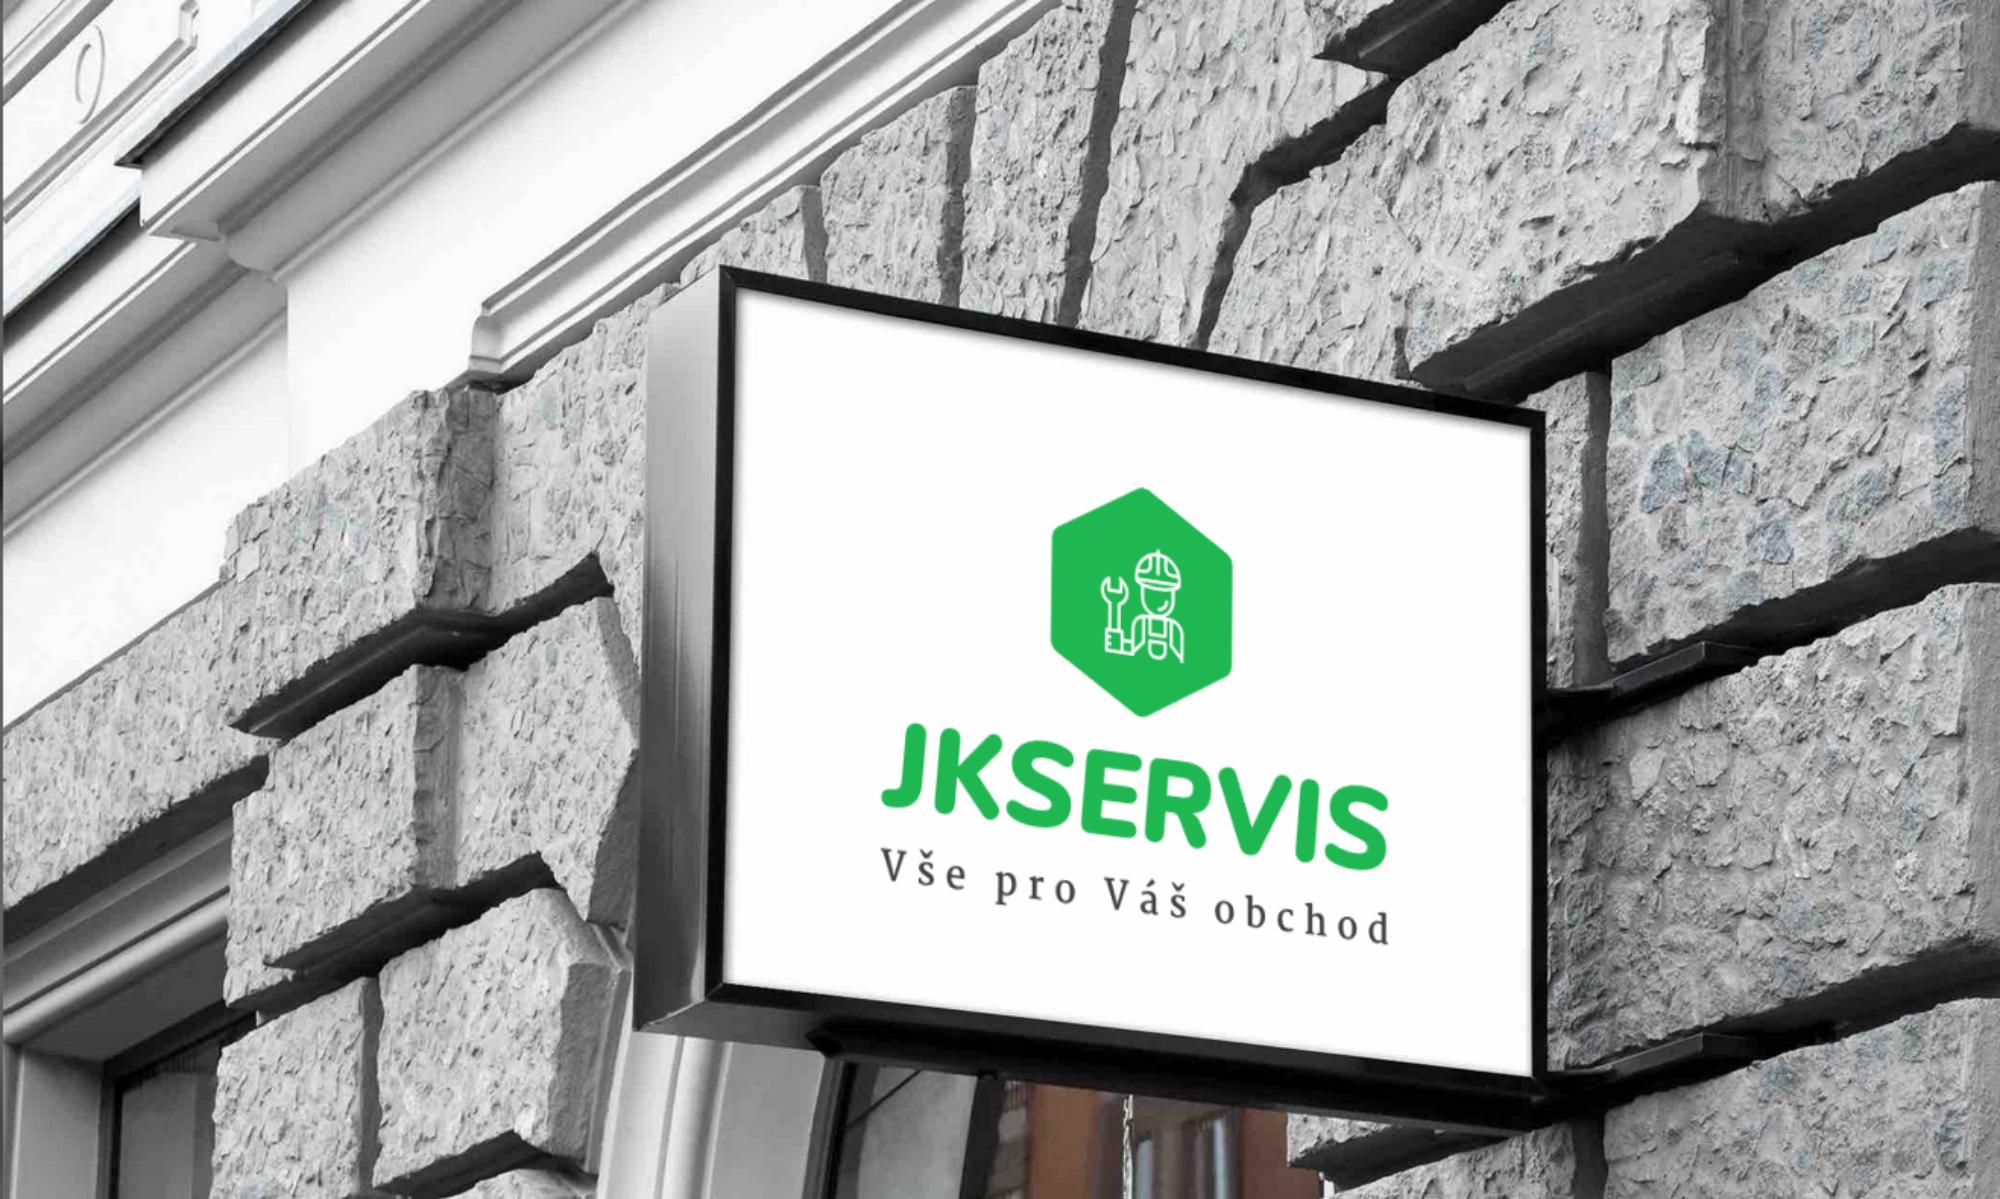 jkservis.cz